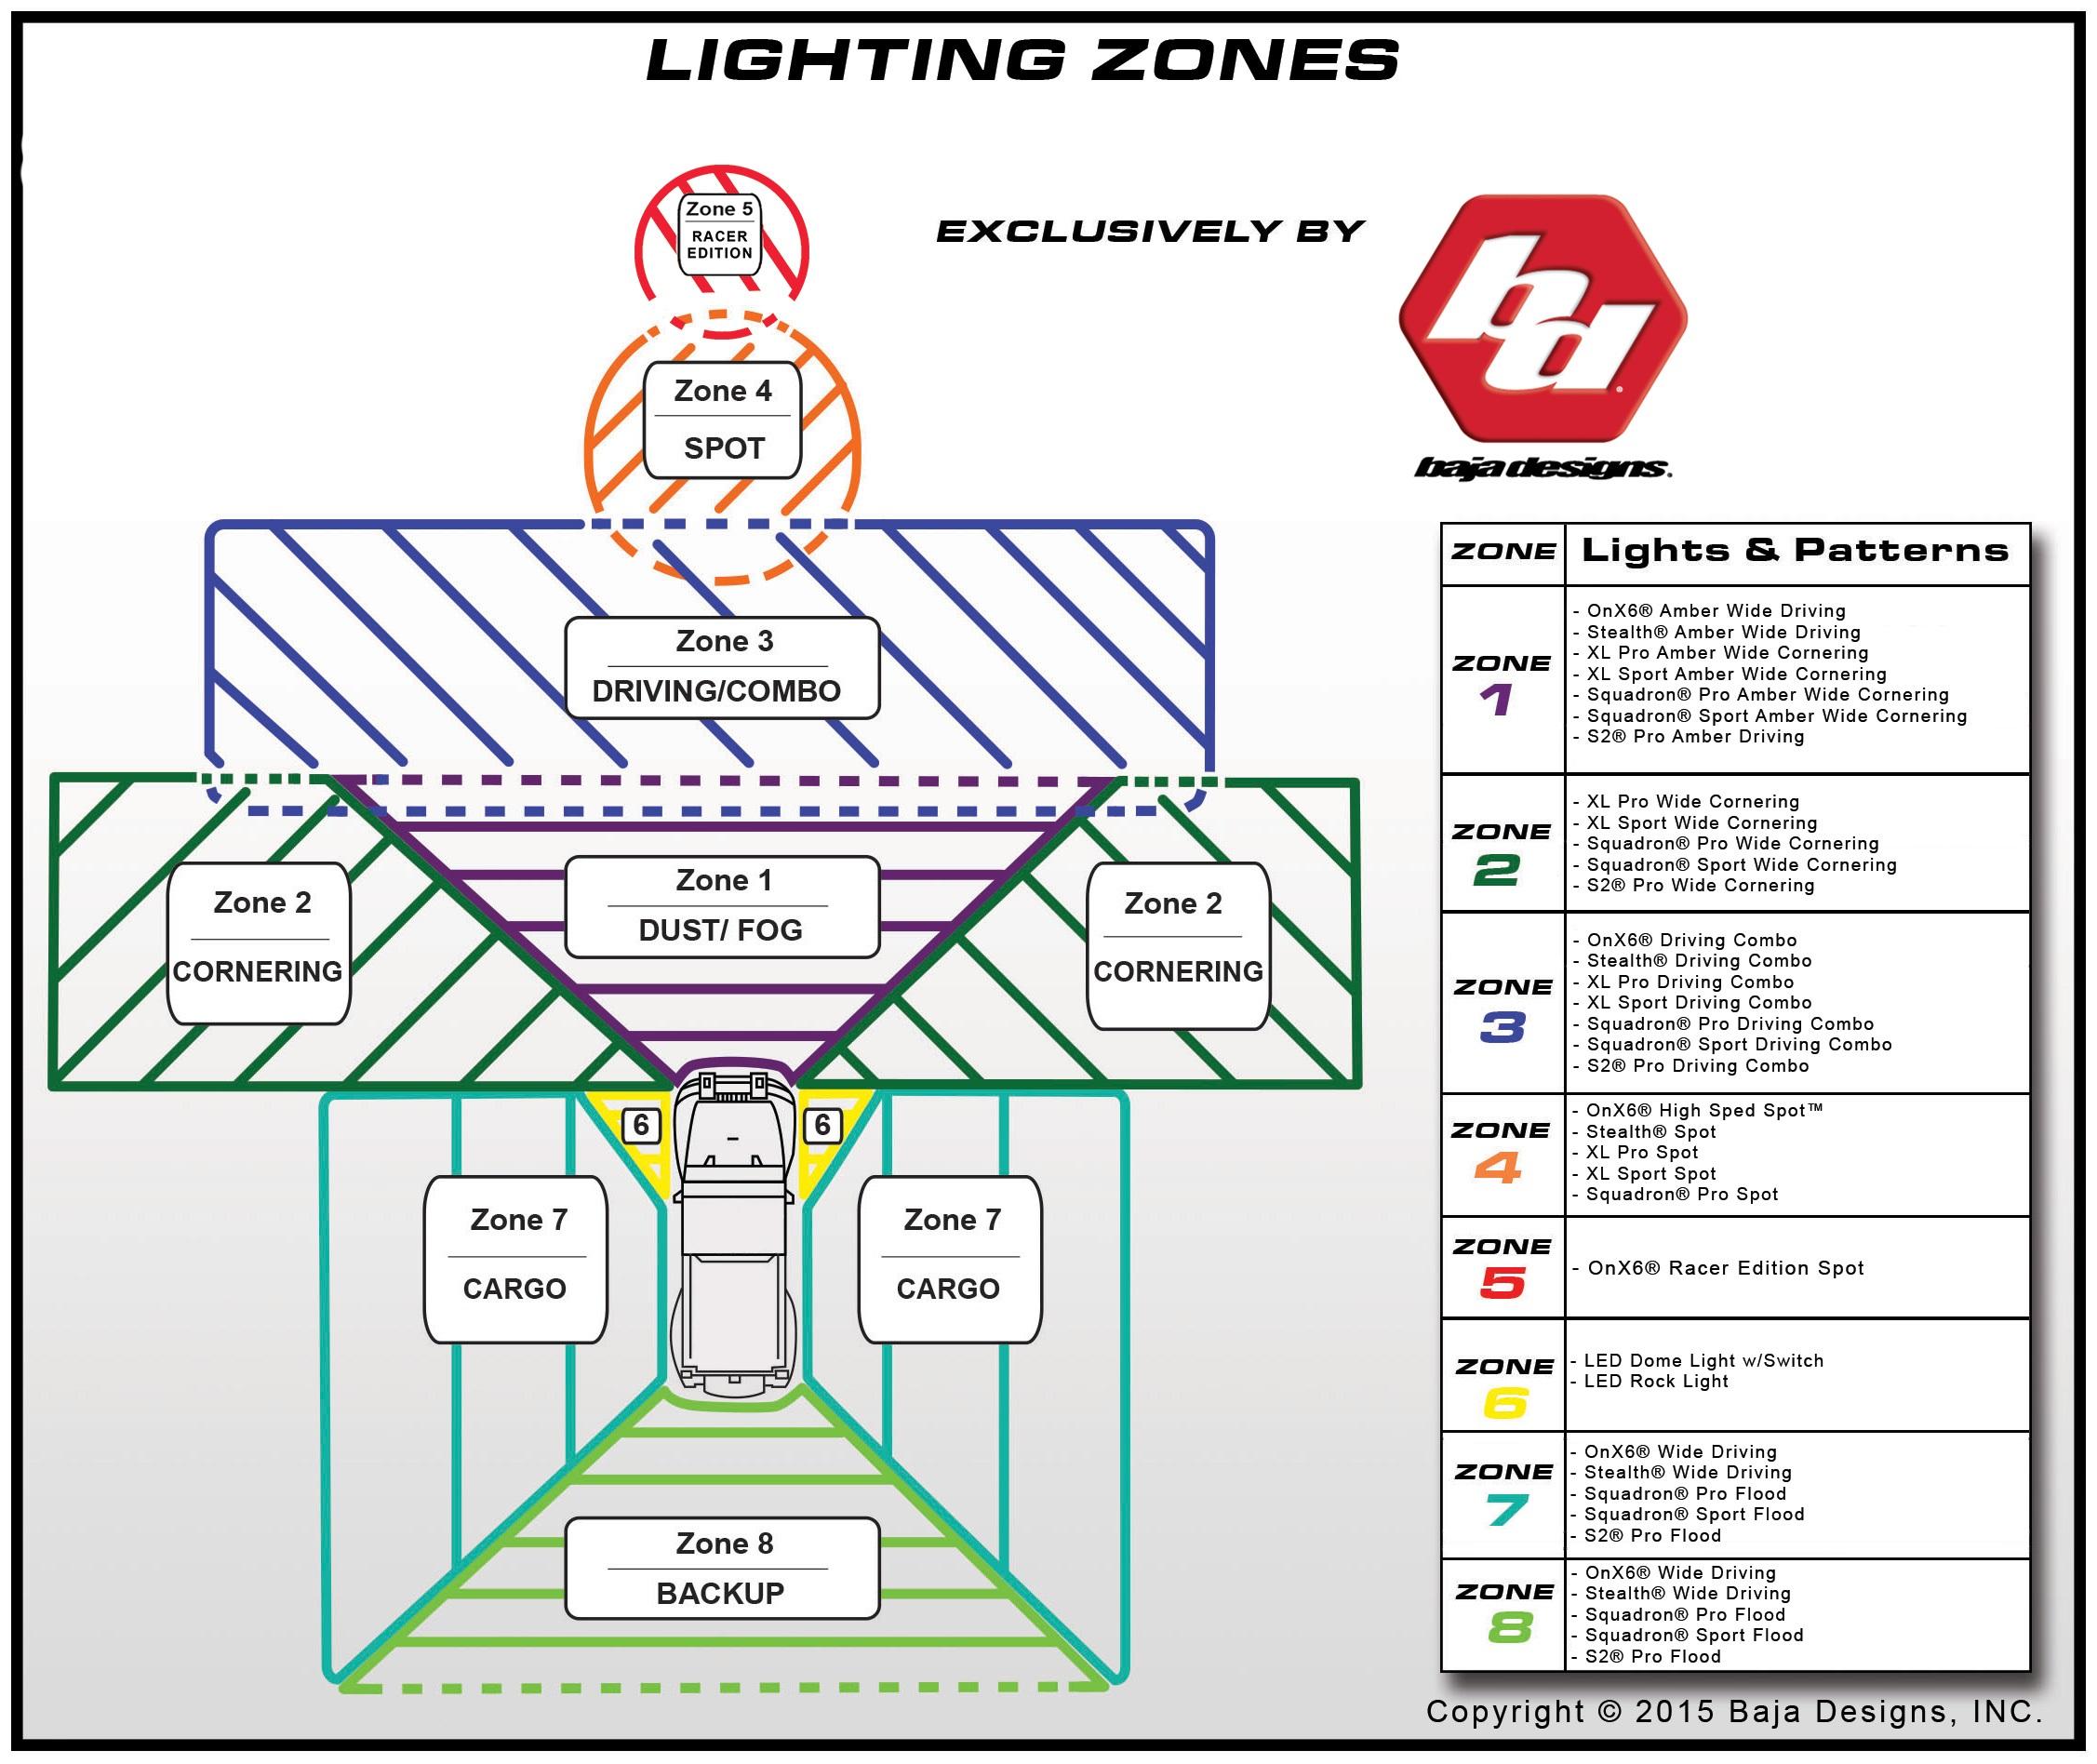 25655746 origpic 73a67f baja designs wiring instructions wiring diagram essig